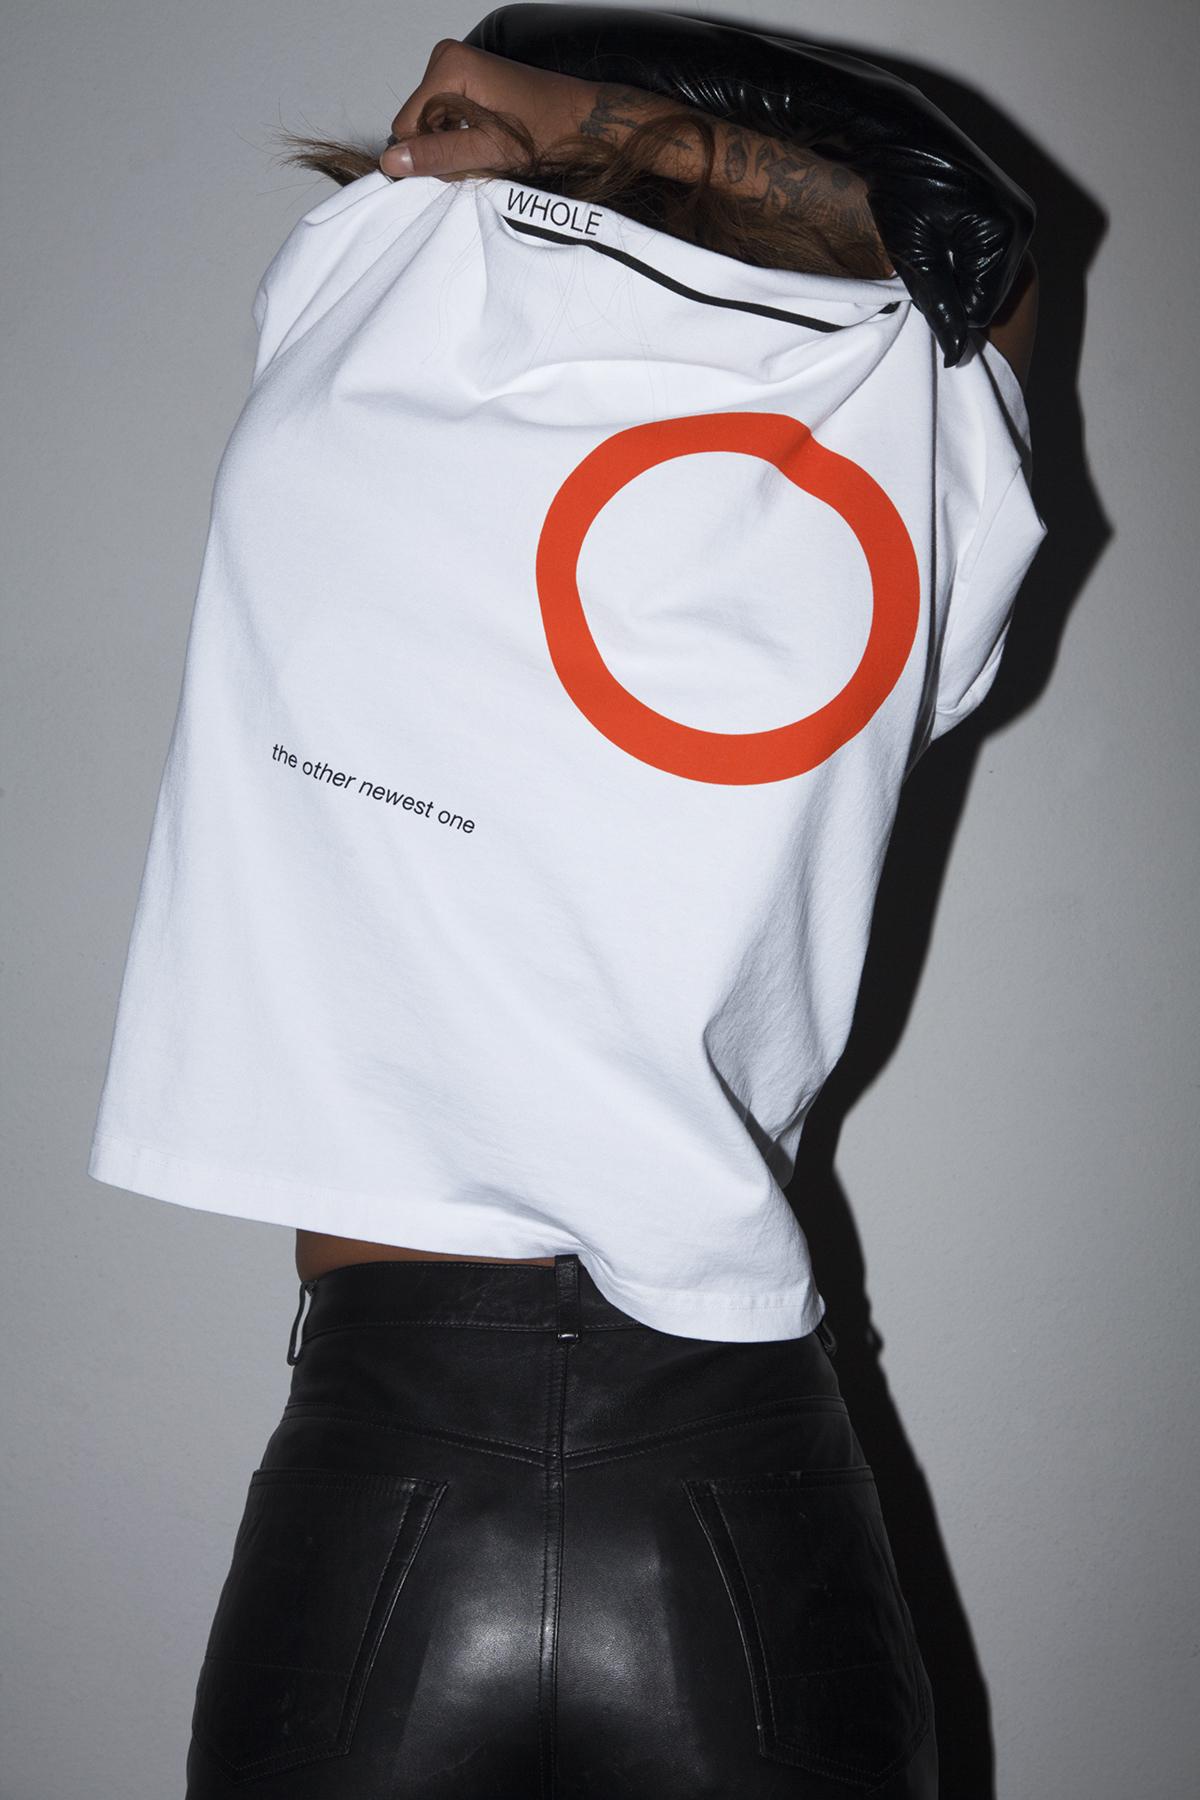 6_Gloves_Rear GI shirt_lifestyle_100.jpg